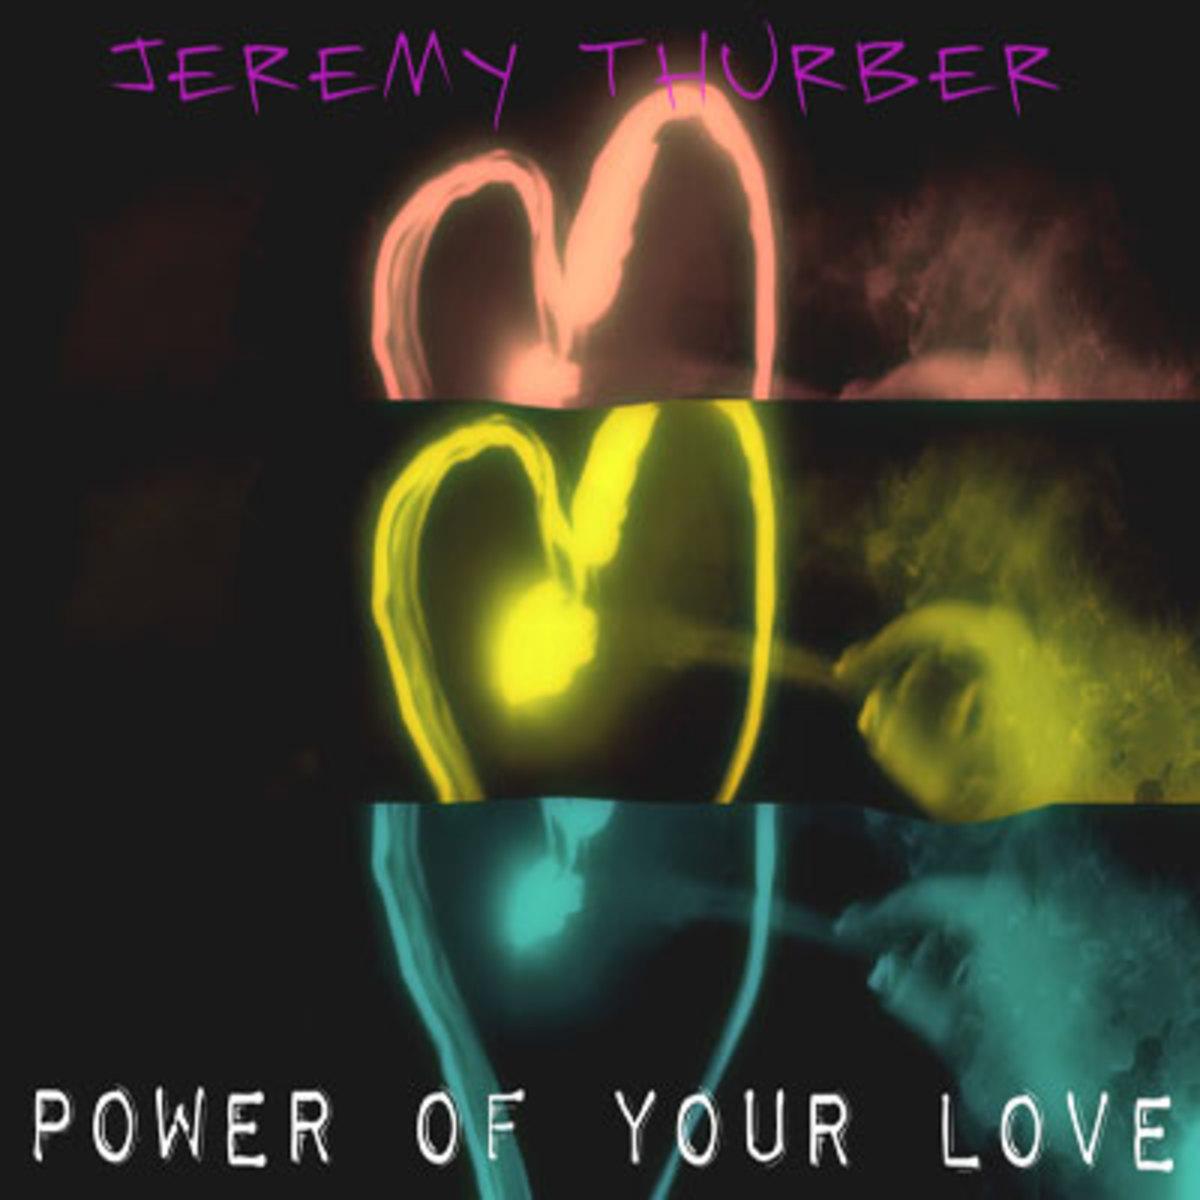 jeremythurber-powerlove.jpg